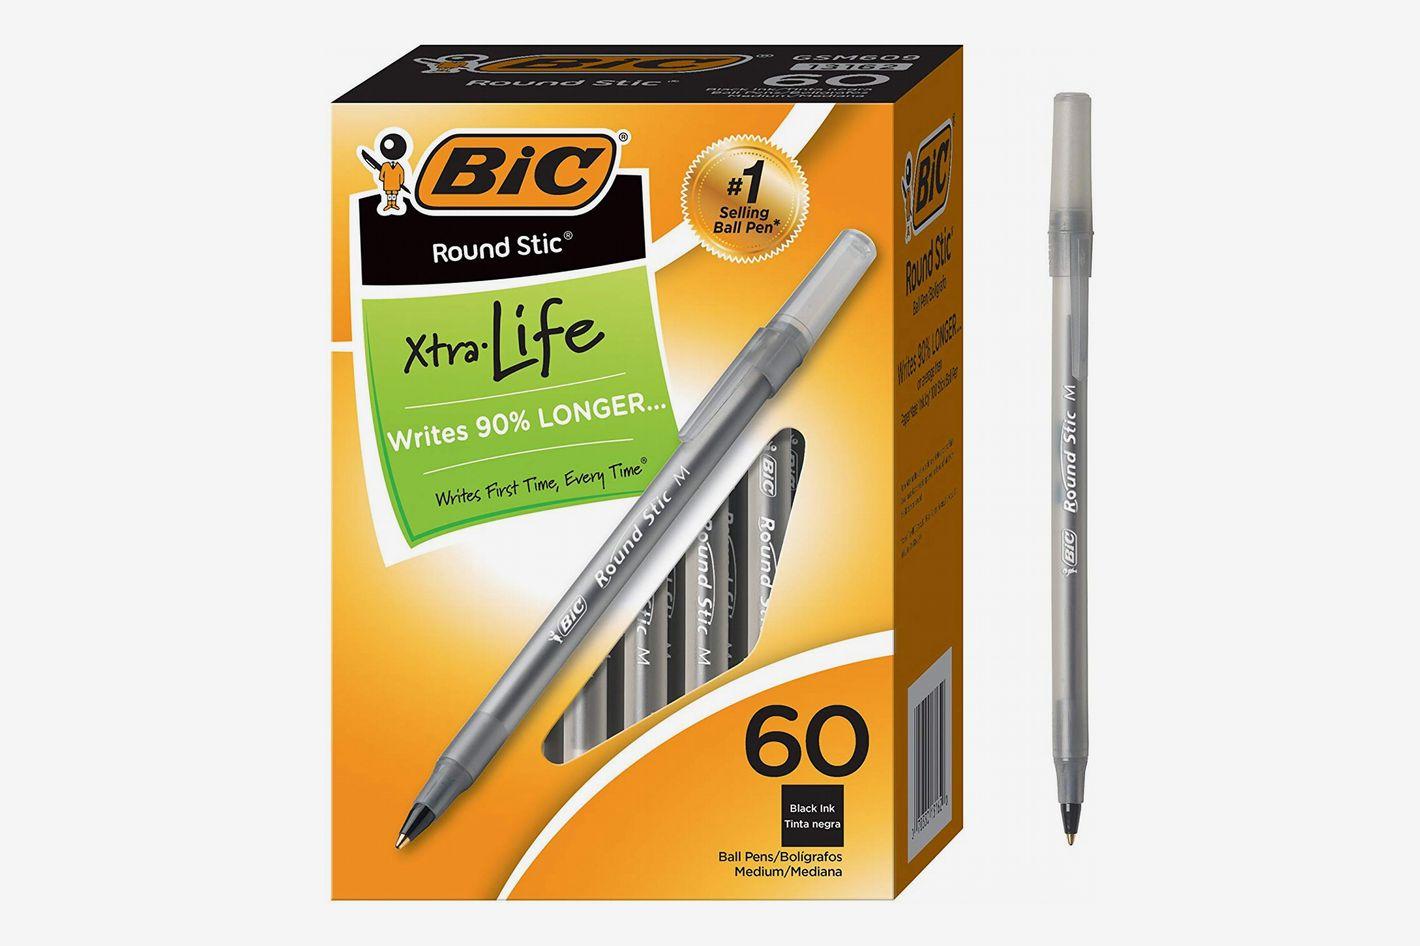 BIC Round Stic Xtra Life Ballpoint Pen, 60 Count